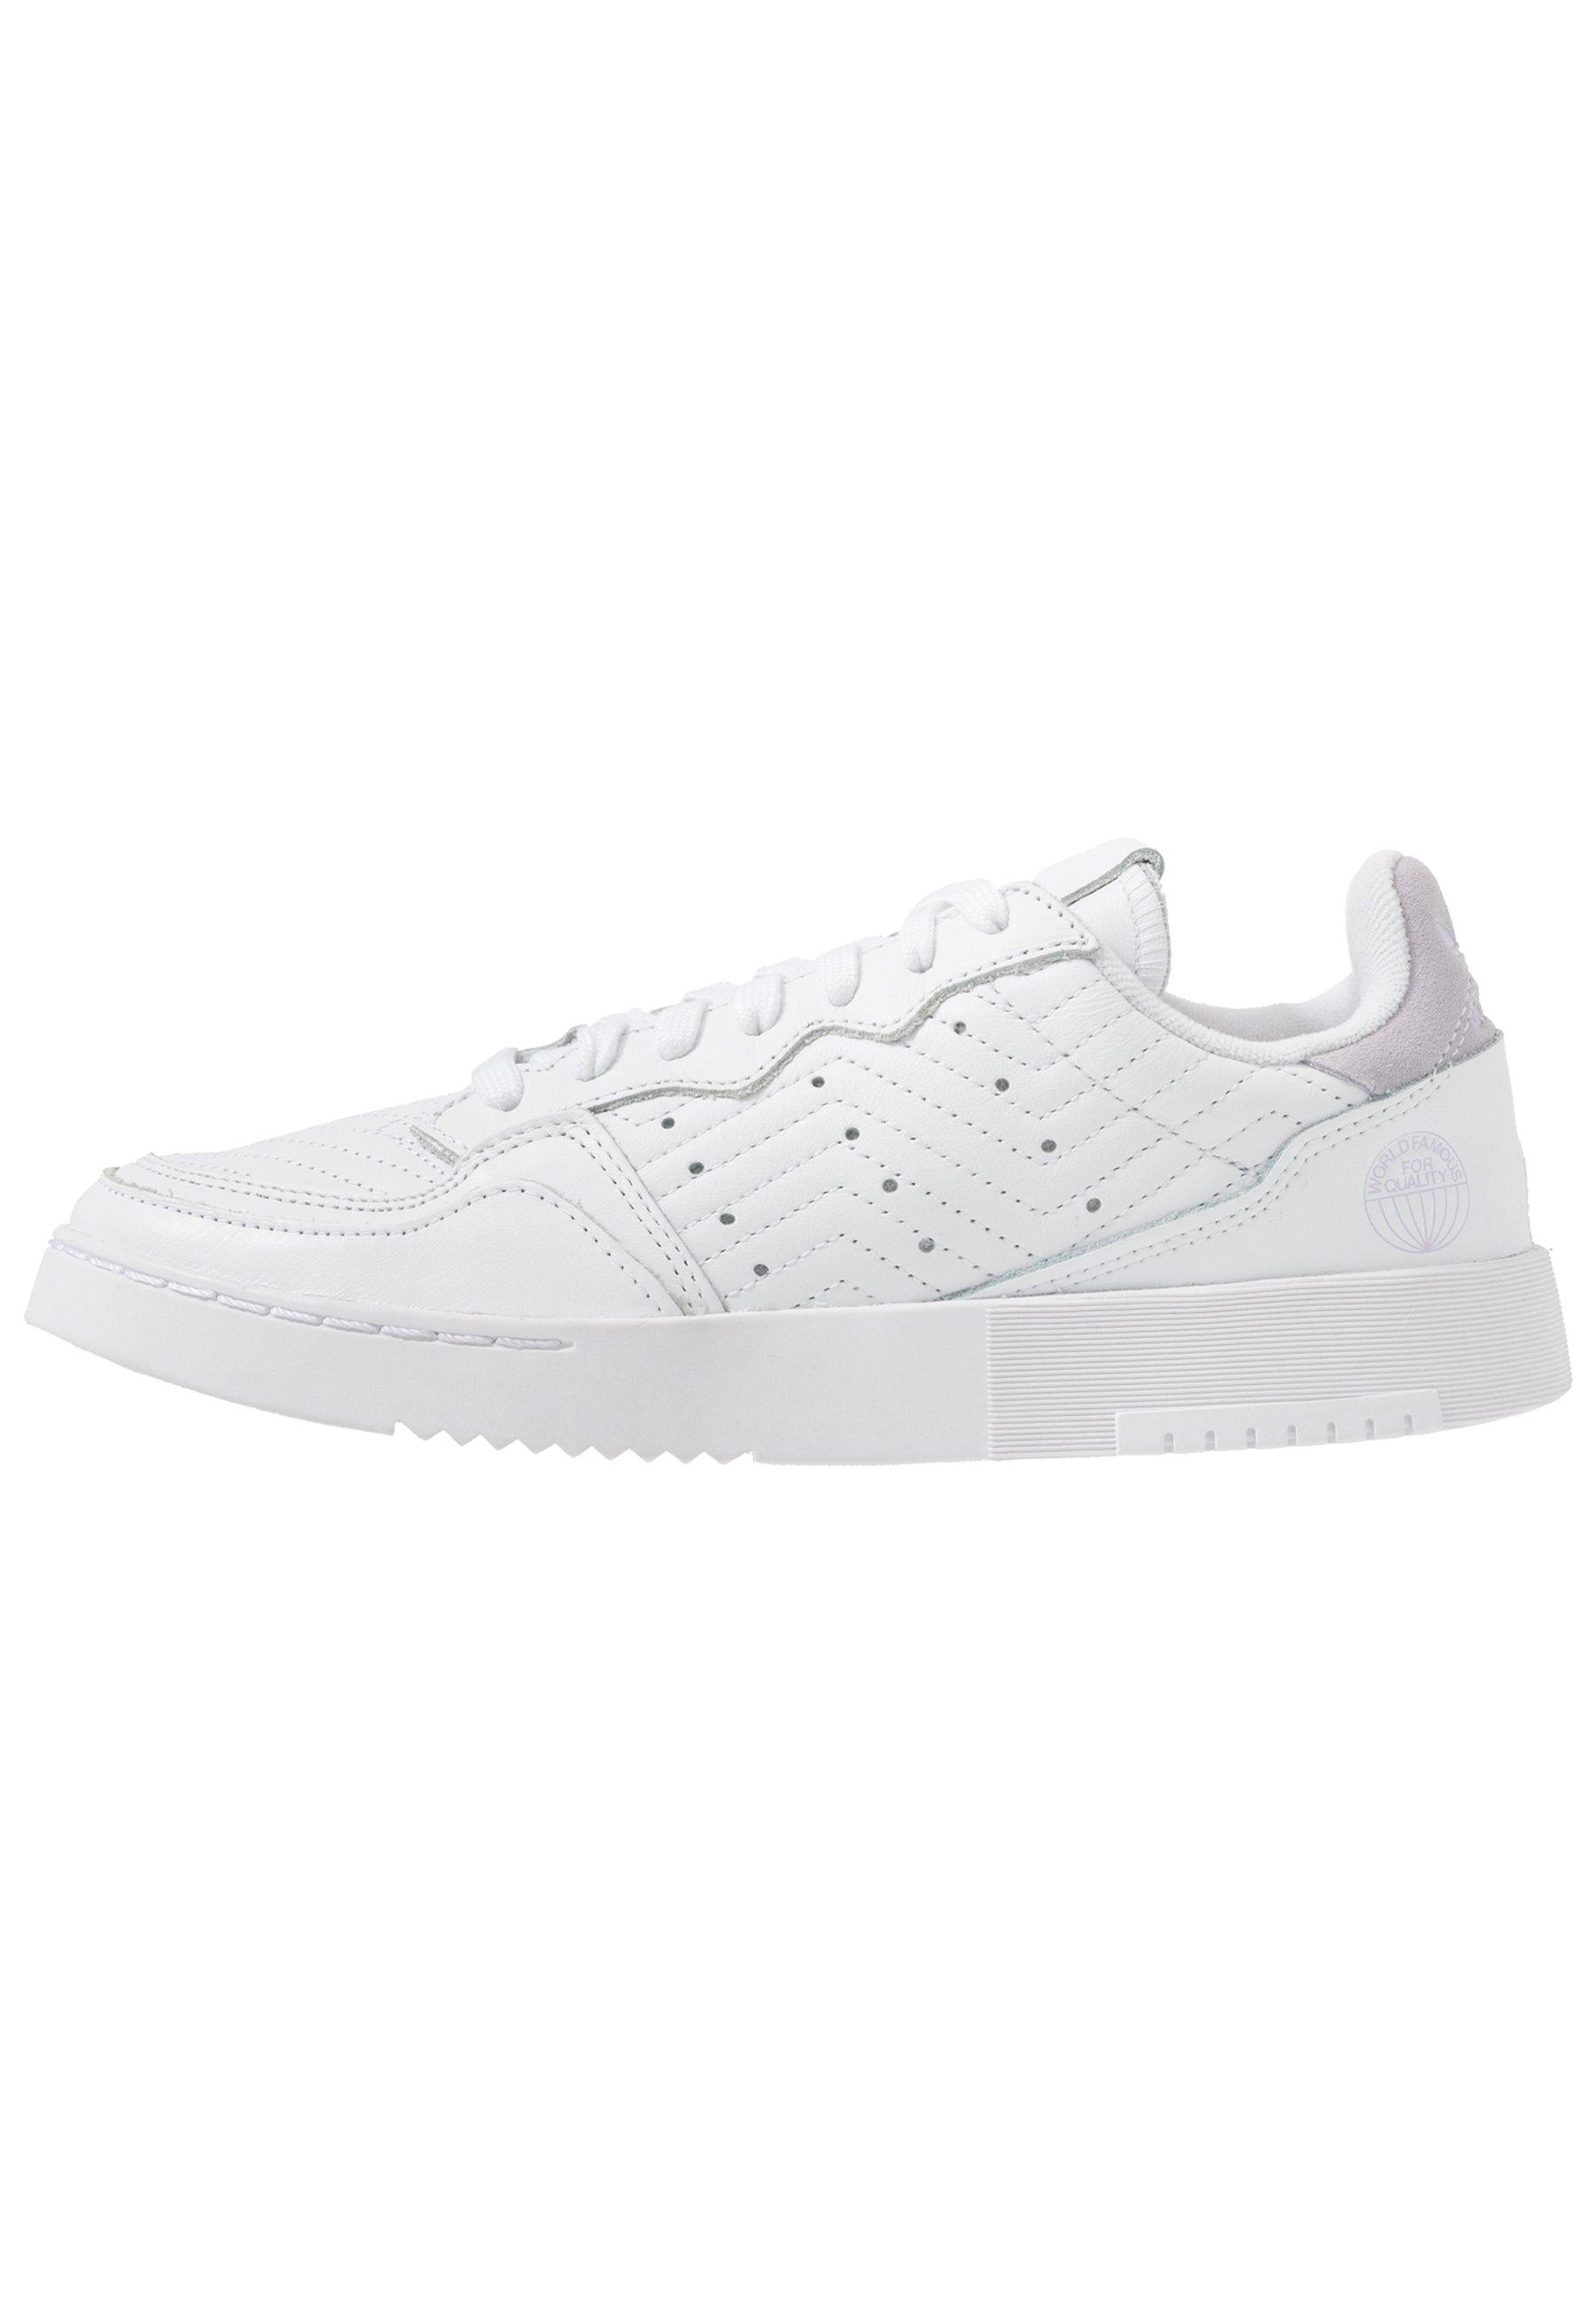 SUPERCOURT Baskets basses footwear whitepurple tint